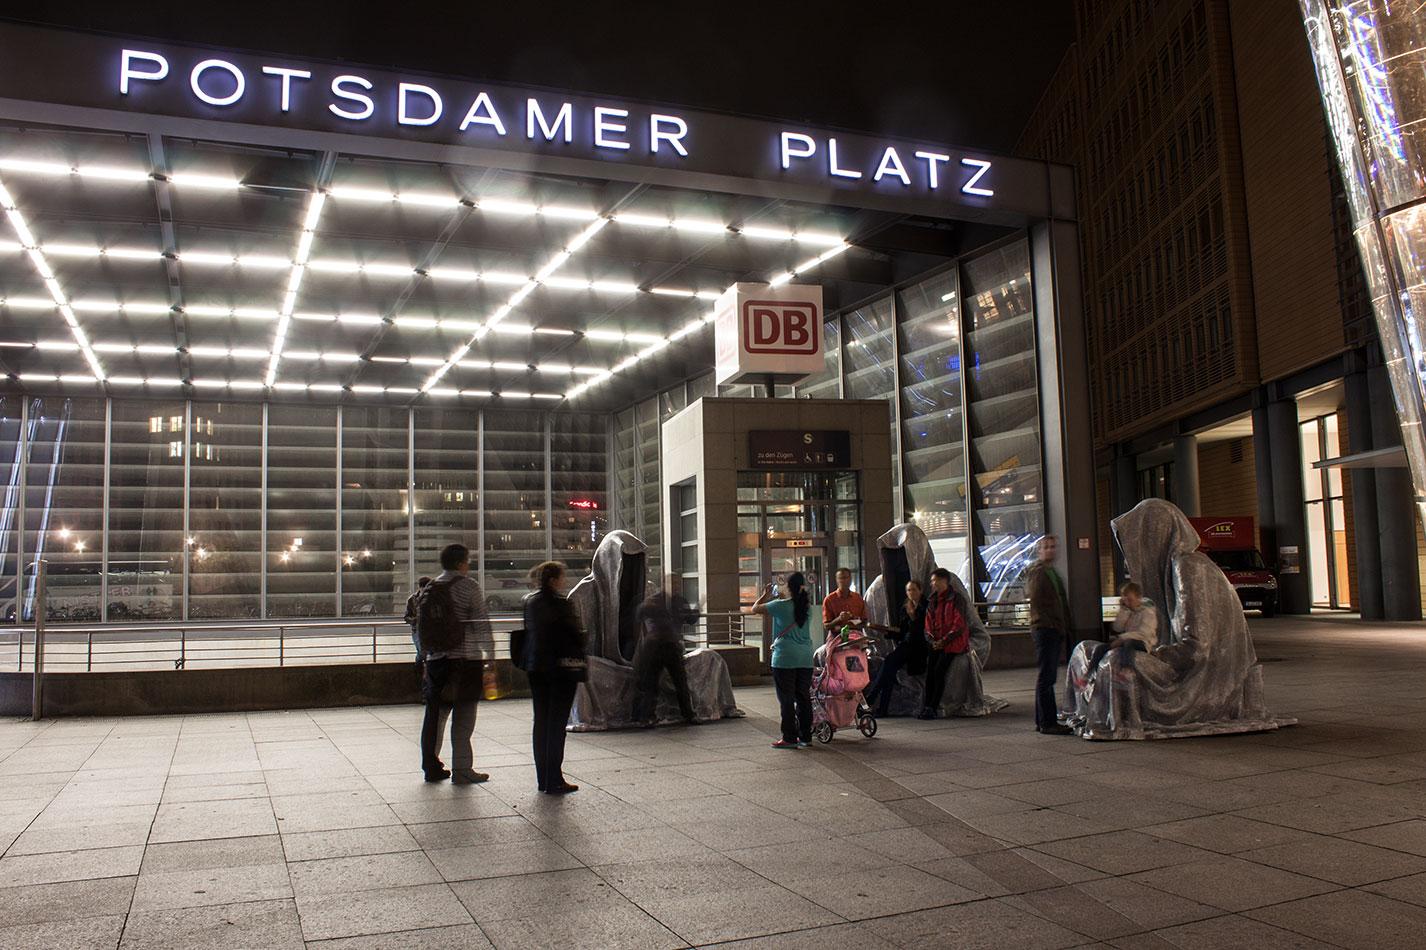 festival-of-lights-berlin-light-art-festival-contemporary-fine-art-design-show-guardiansof-time-manfred-kili-kielnhofer-sculpture-2896